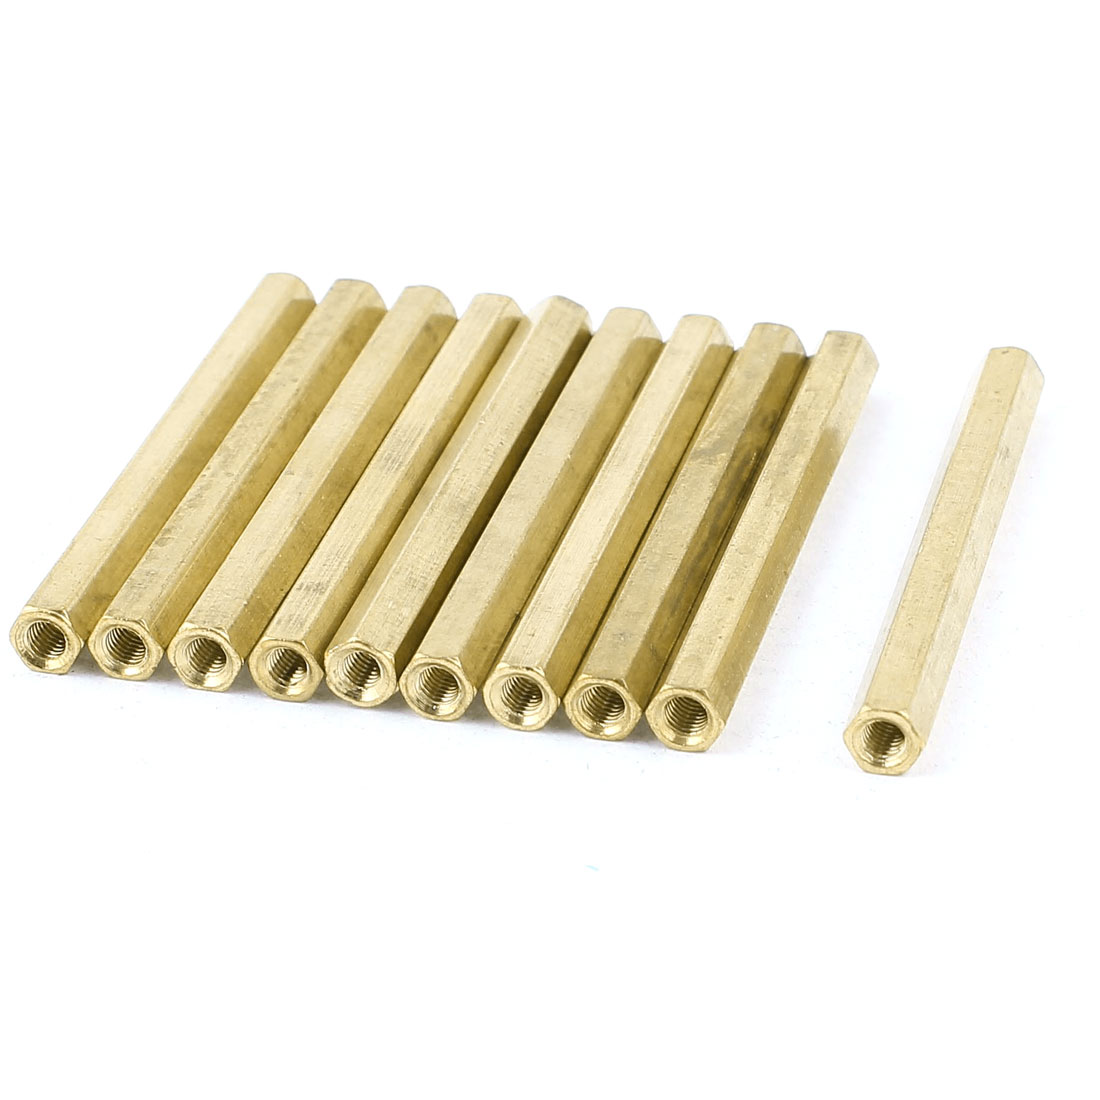 M3 x 50mm Female/Female Thread Brass Hex Standoff PCB Pillar Spacer 10pcs